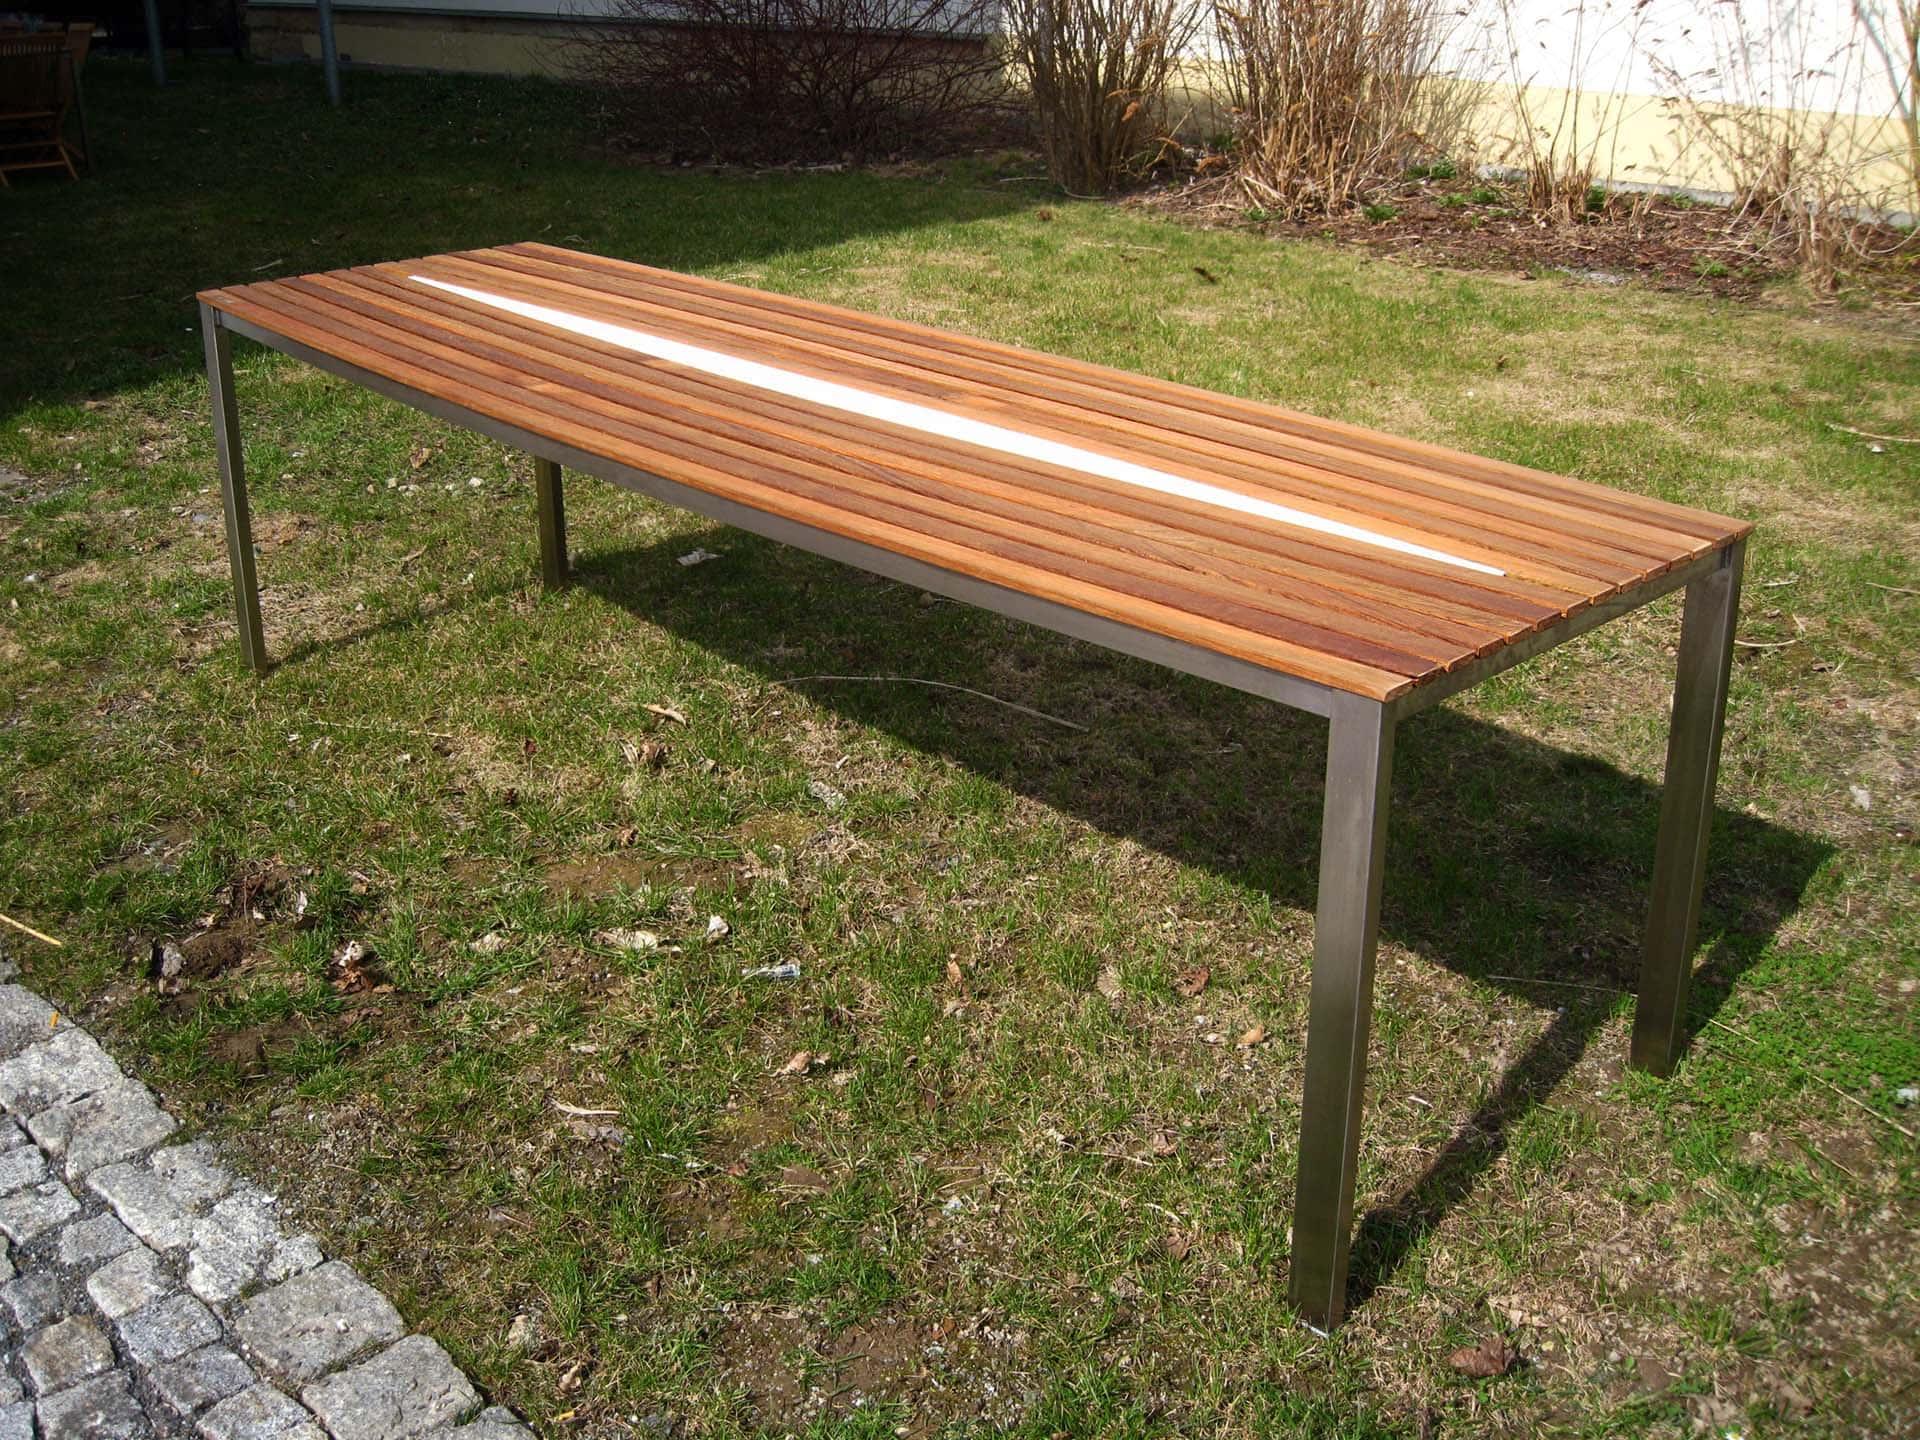 Design Tisch Sealine Nummer 3 aus Holz Teak Edel-Stahl by Sebastian Bohry timeless Design